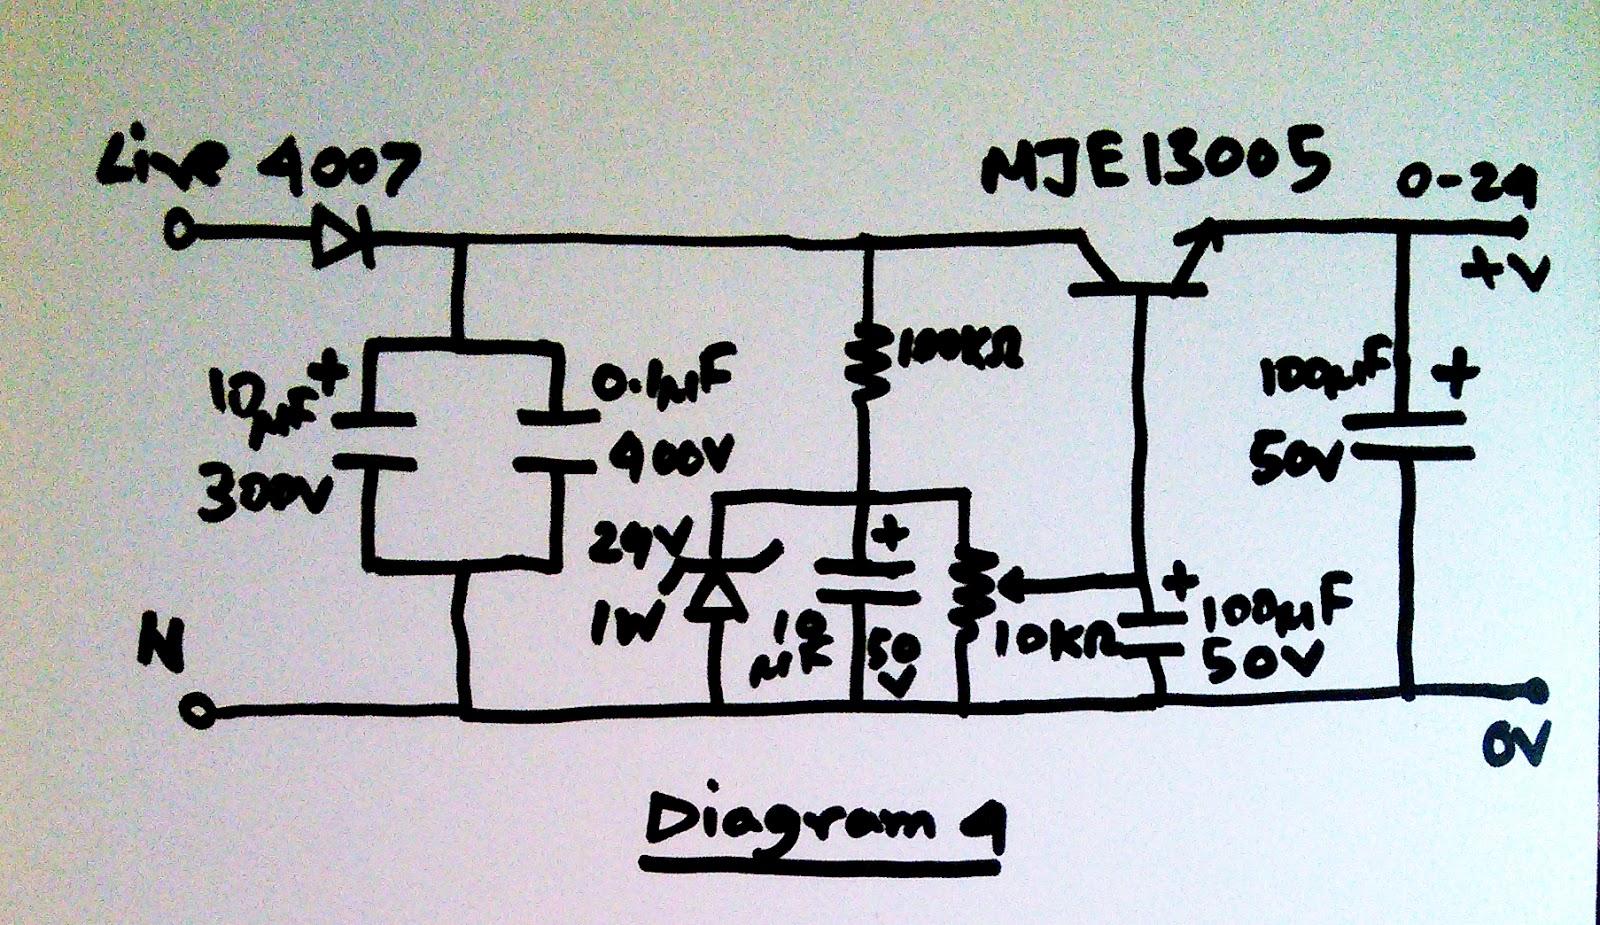 High Voltage Supply Diagrams Detailed Schematics Diagram 12 Volt Regulator Circuit Also Lm317 Scavengers Blog Transformerless Power Unit